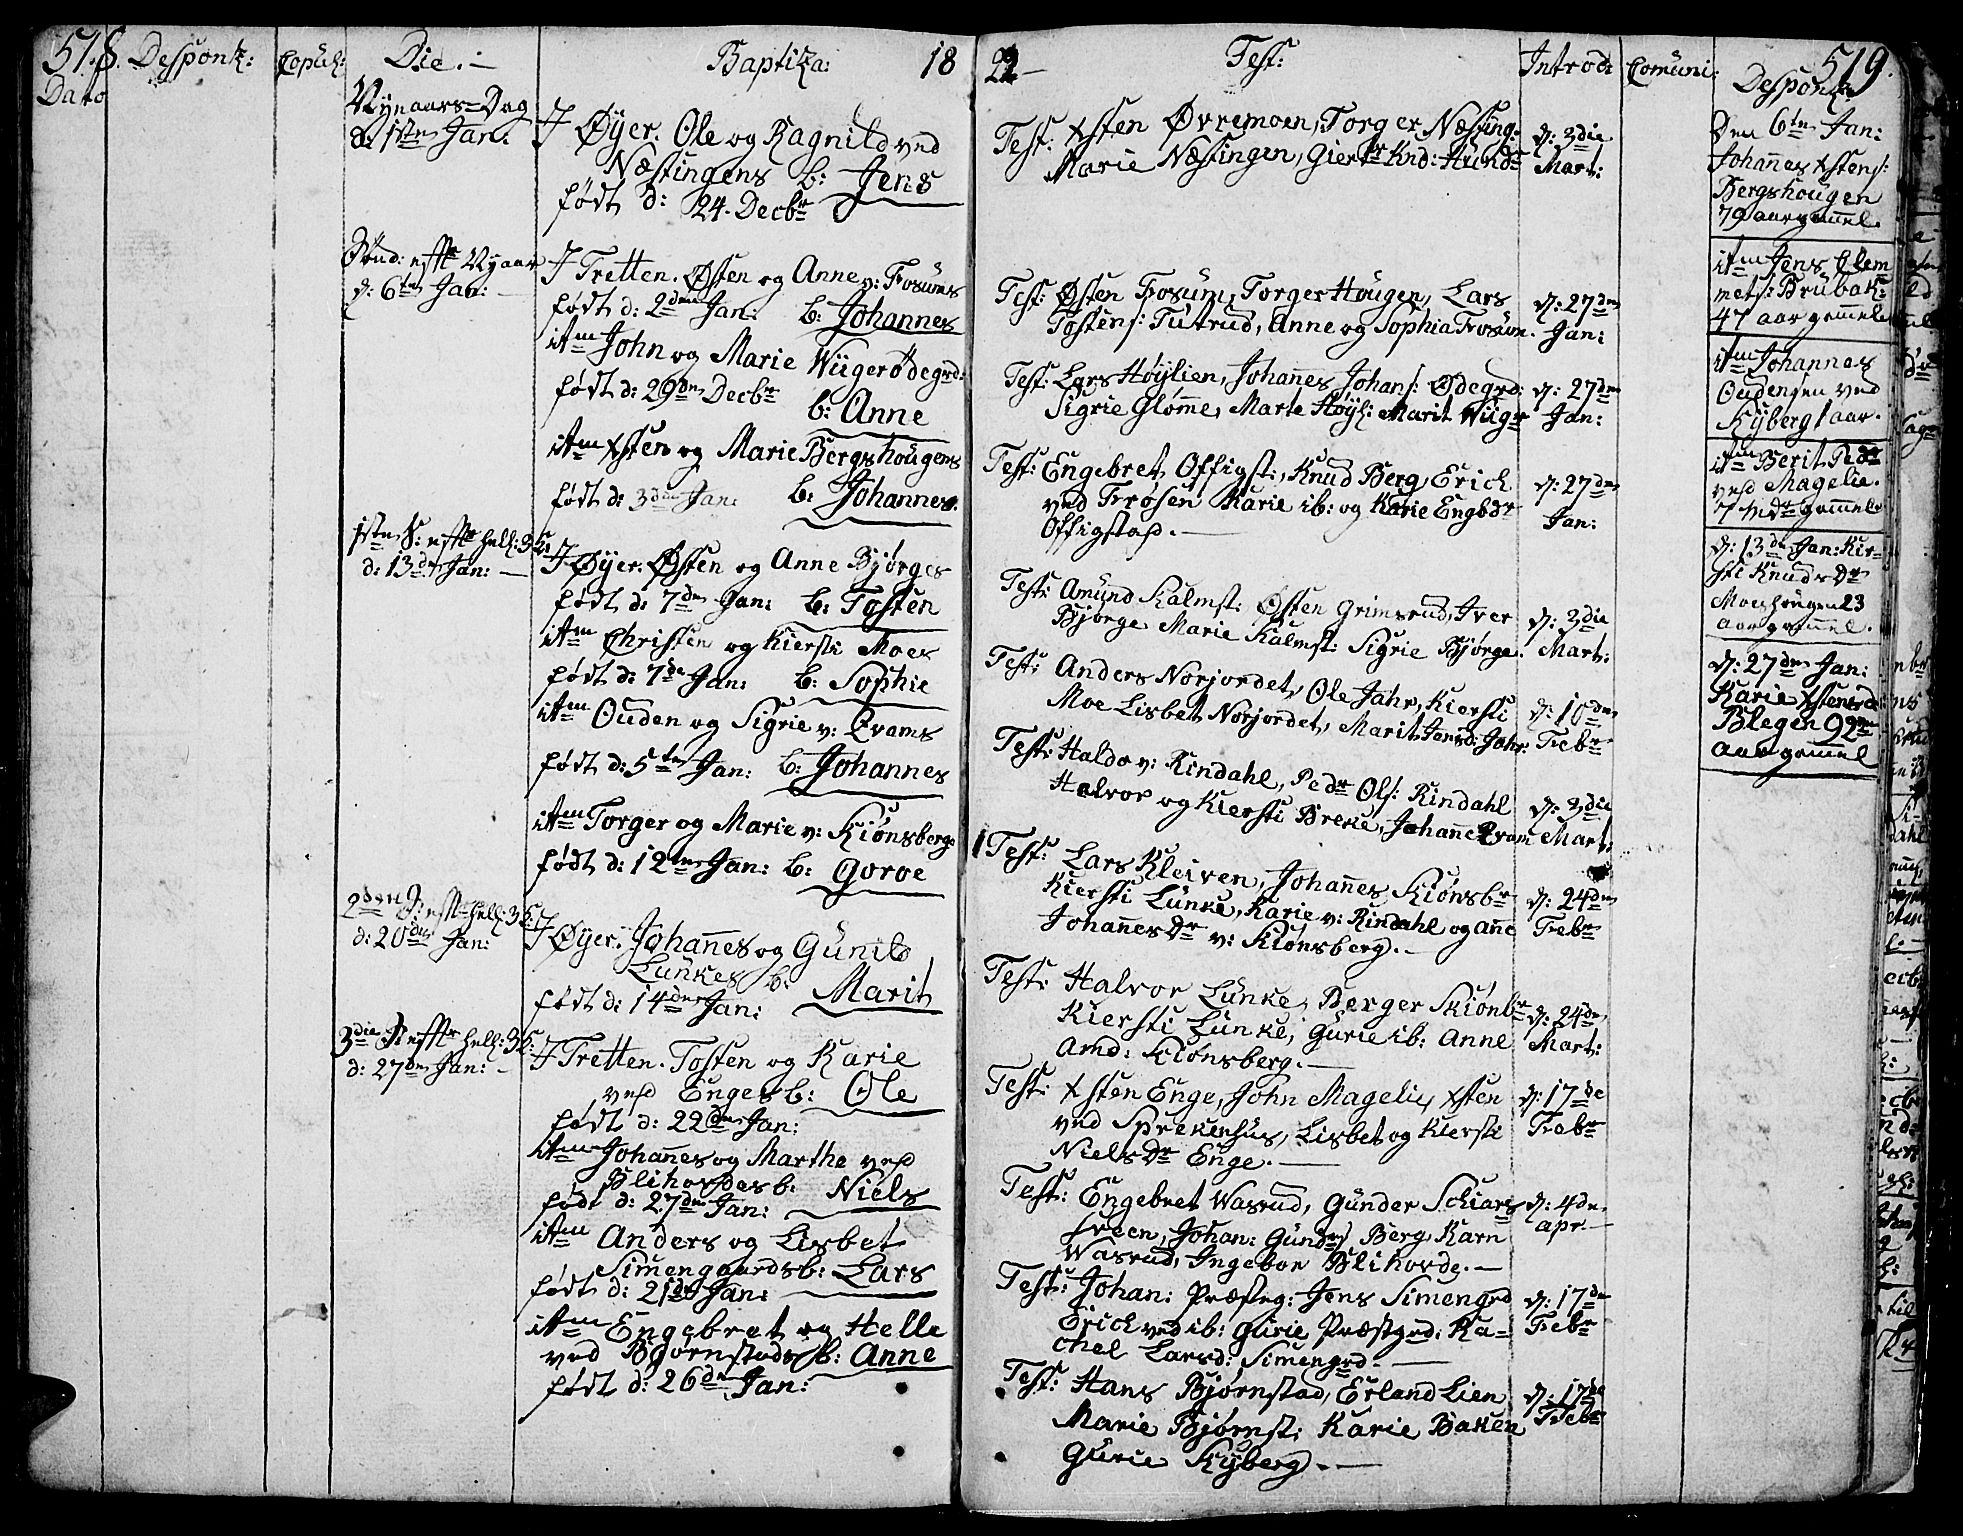 SAH, Øyer prestekontor, Ministerialbok nr. 3, 1784-1824, s. 518-519